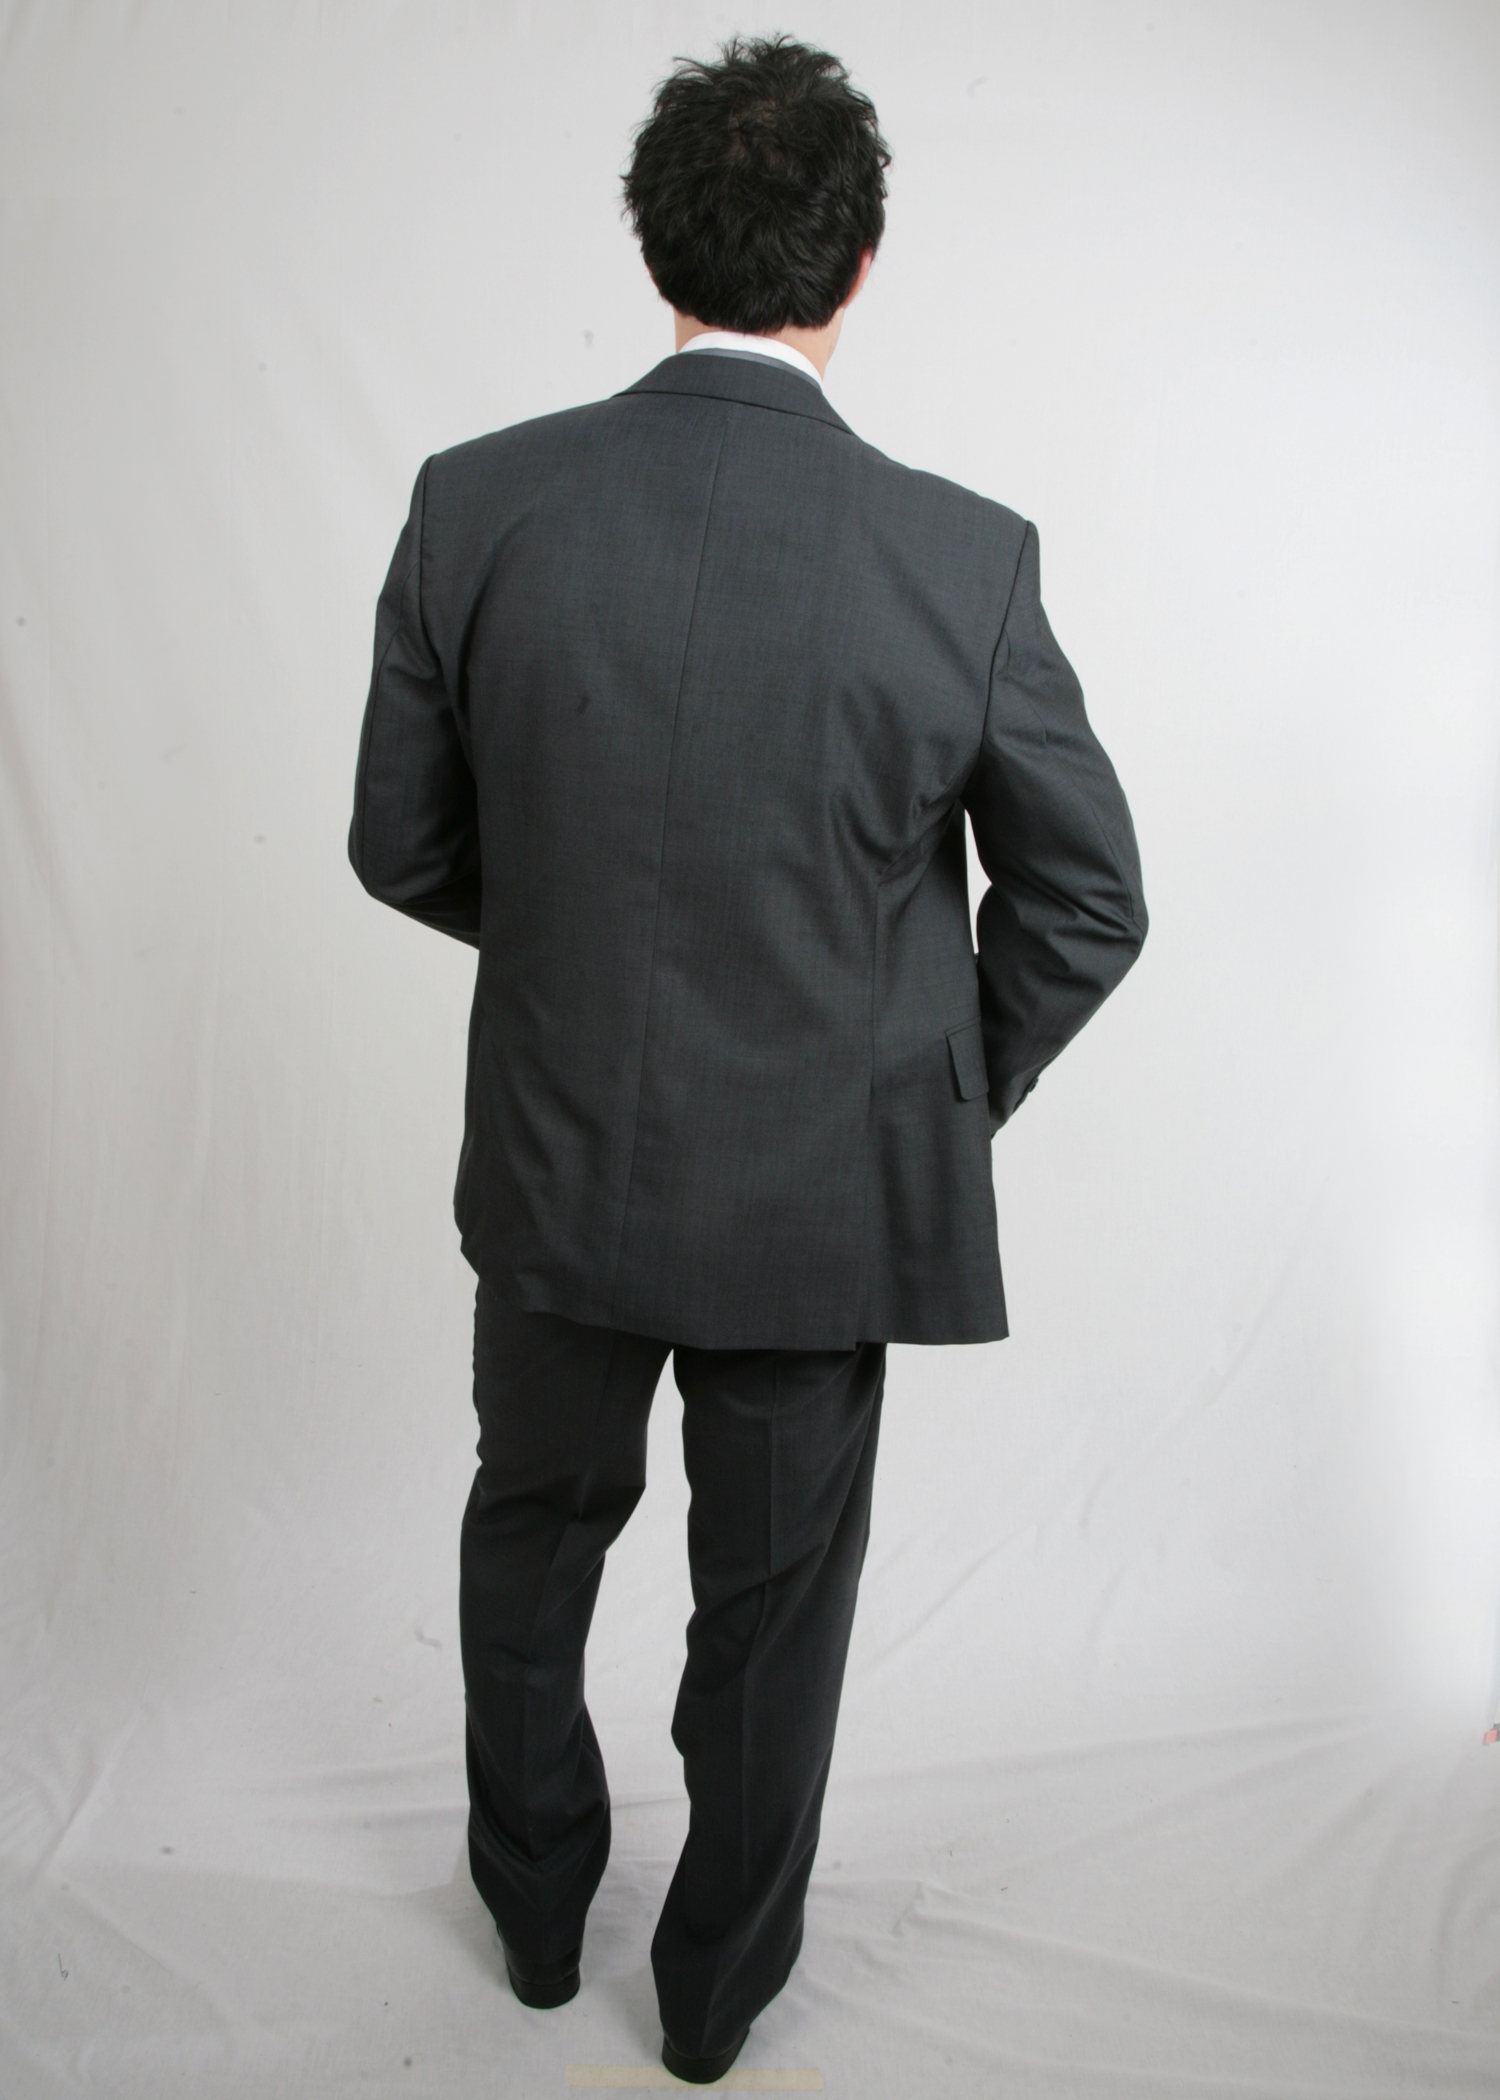 Short Grey Wilvorst Lightweight Suit Hire